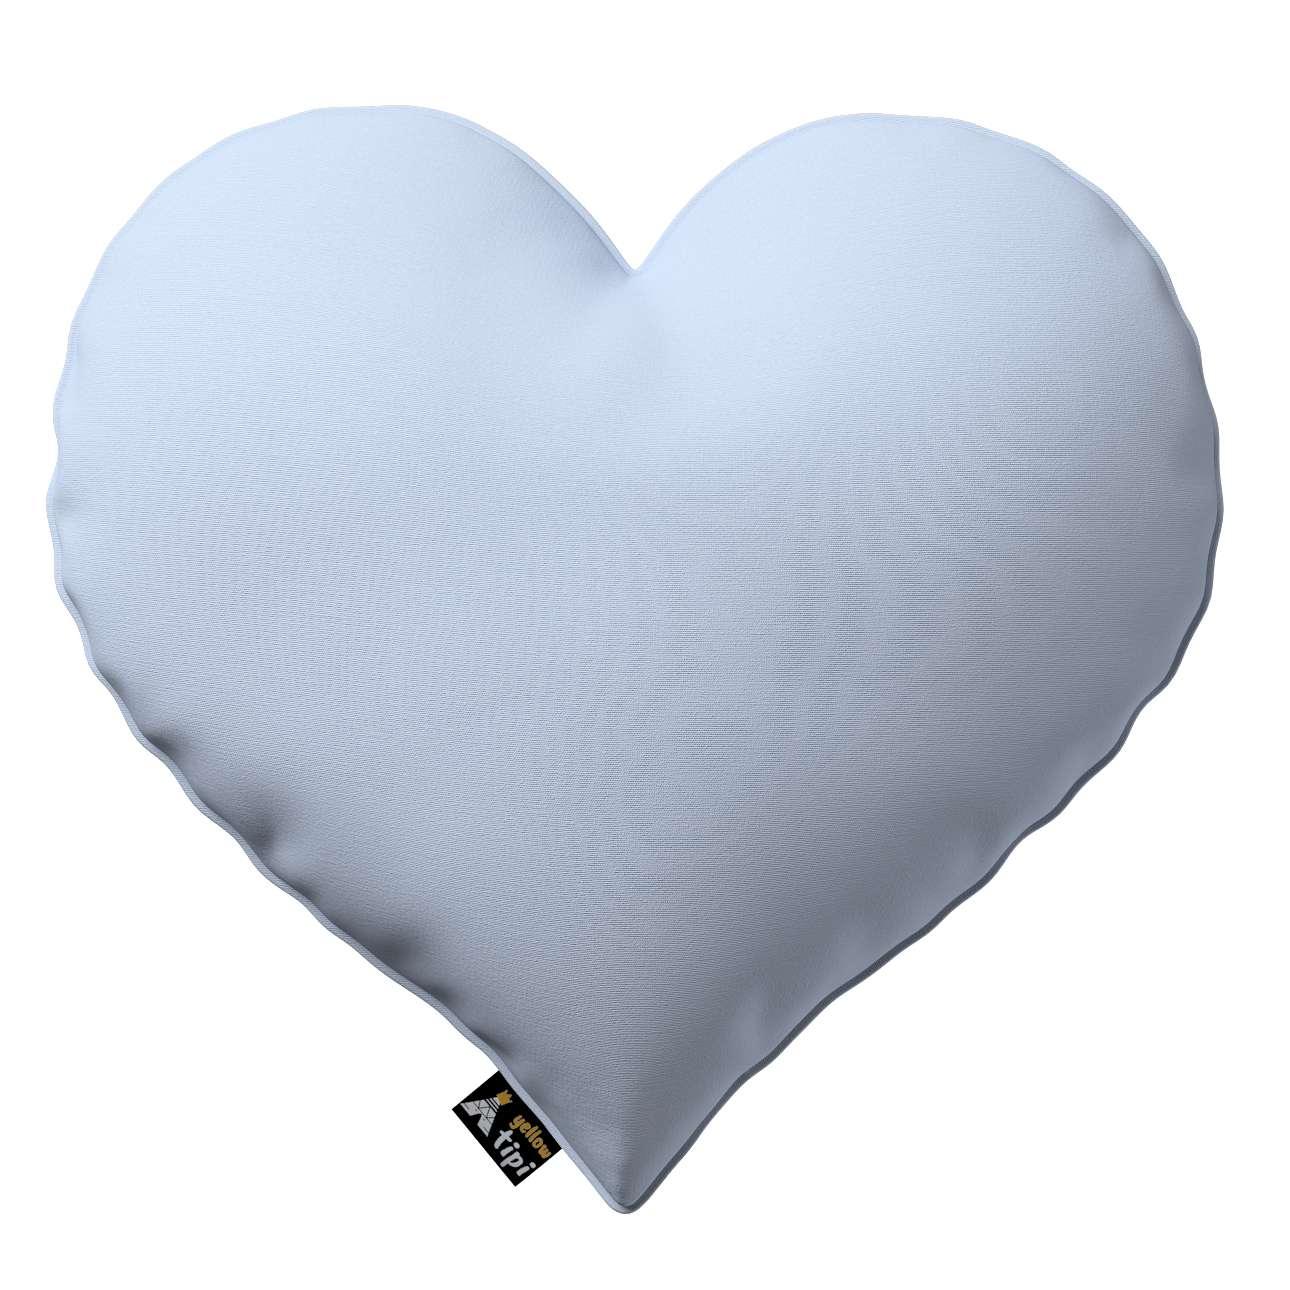 Heart of Love pagalvėlė kolekcijoje Happiness, audinys: 133-35